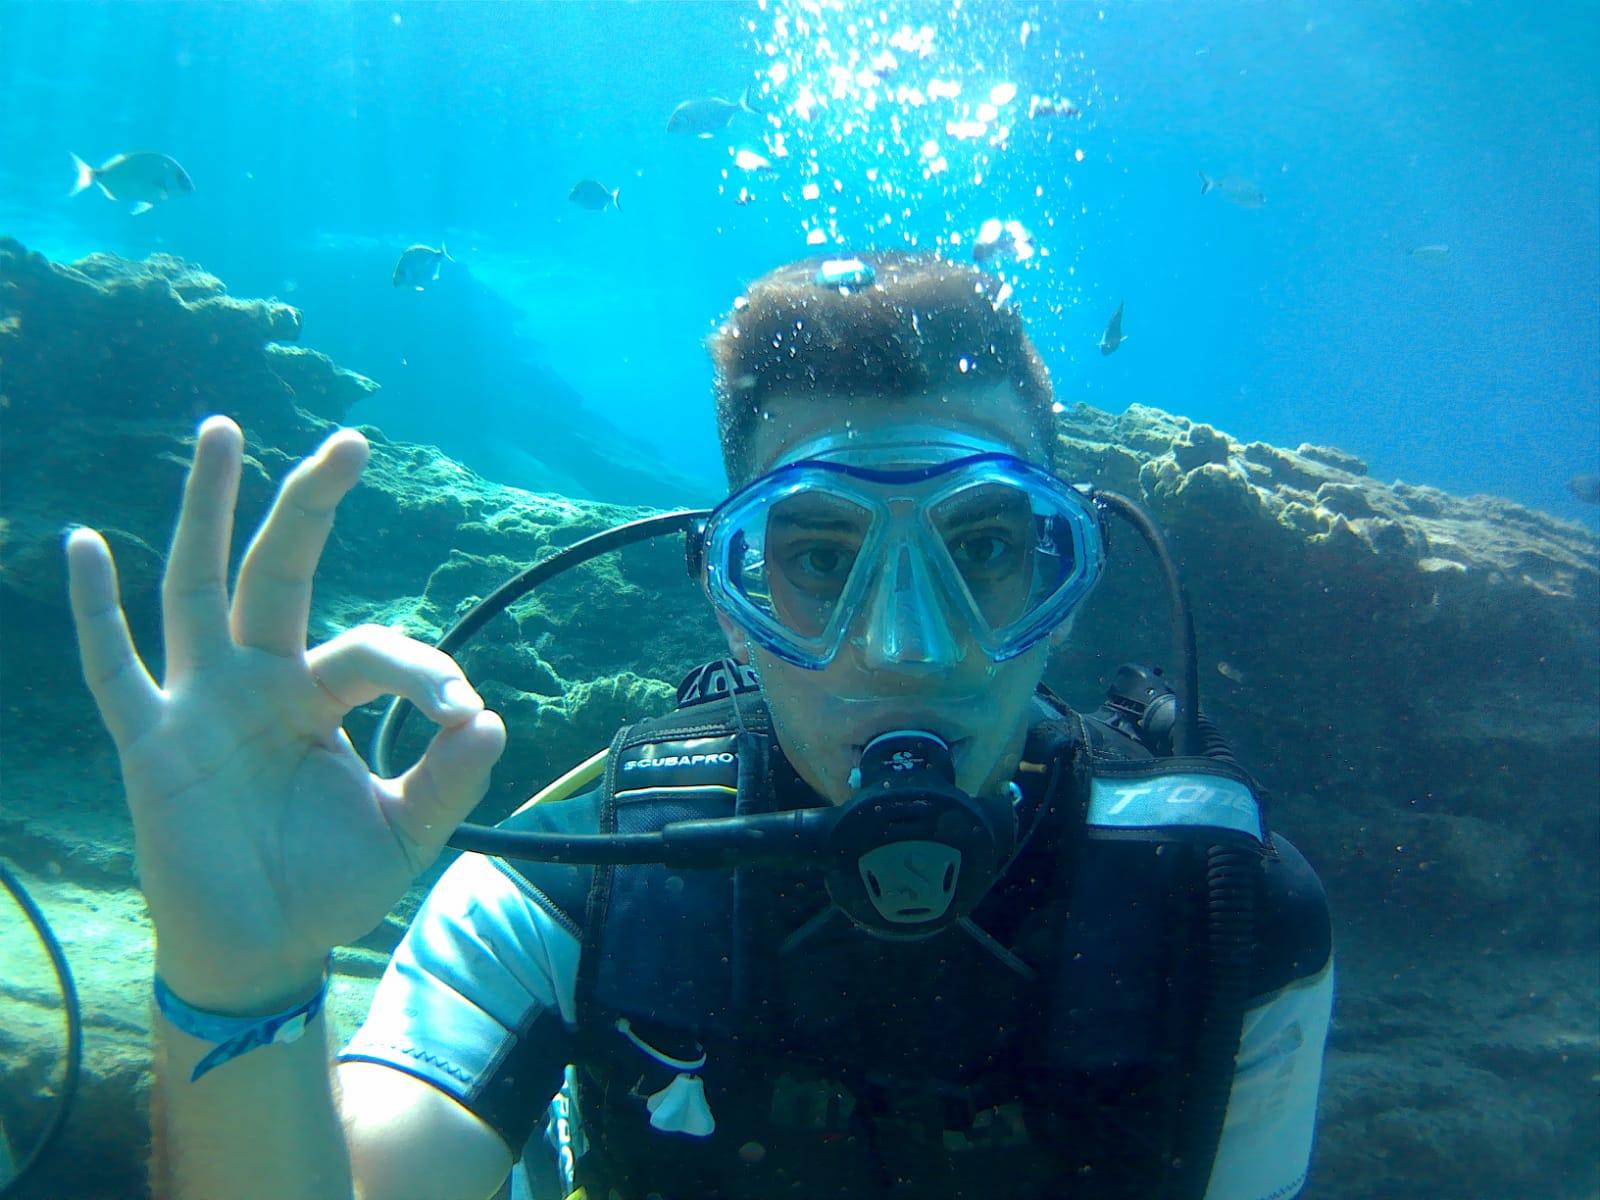 Bodrum dalış turu fiyatları 2021